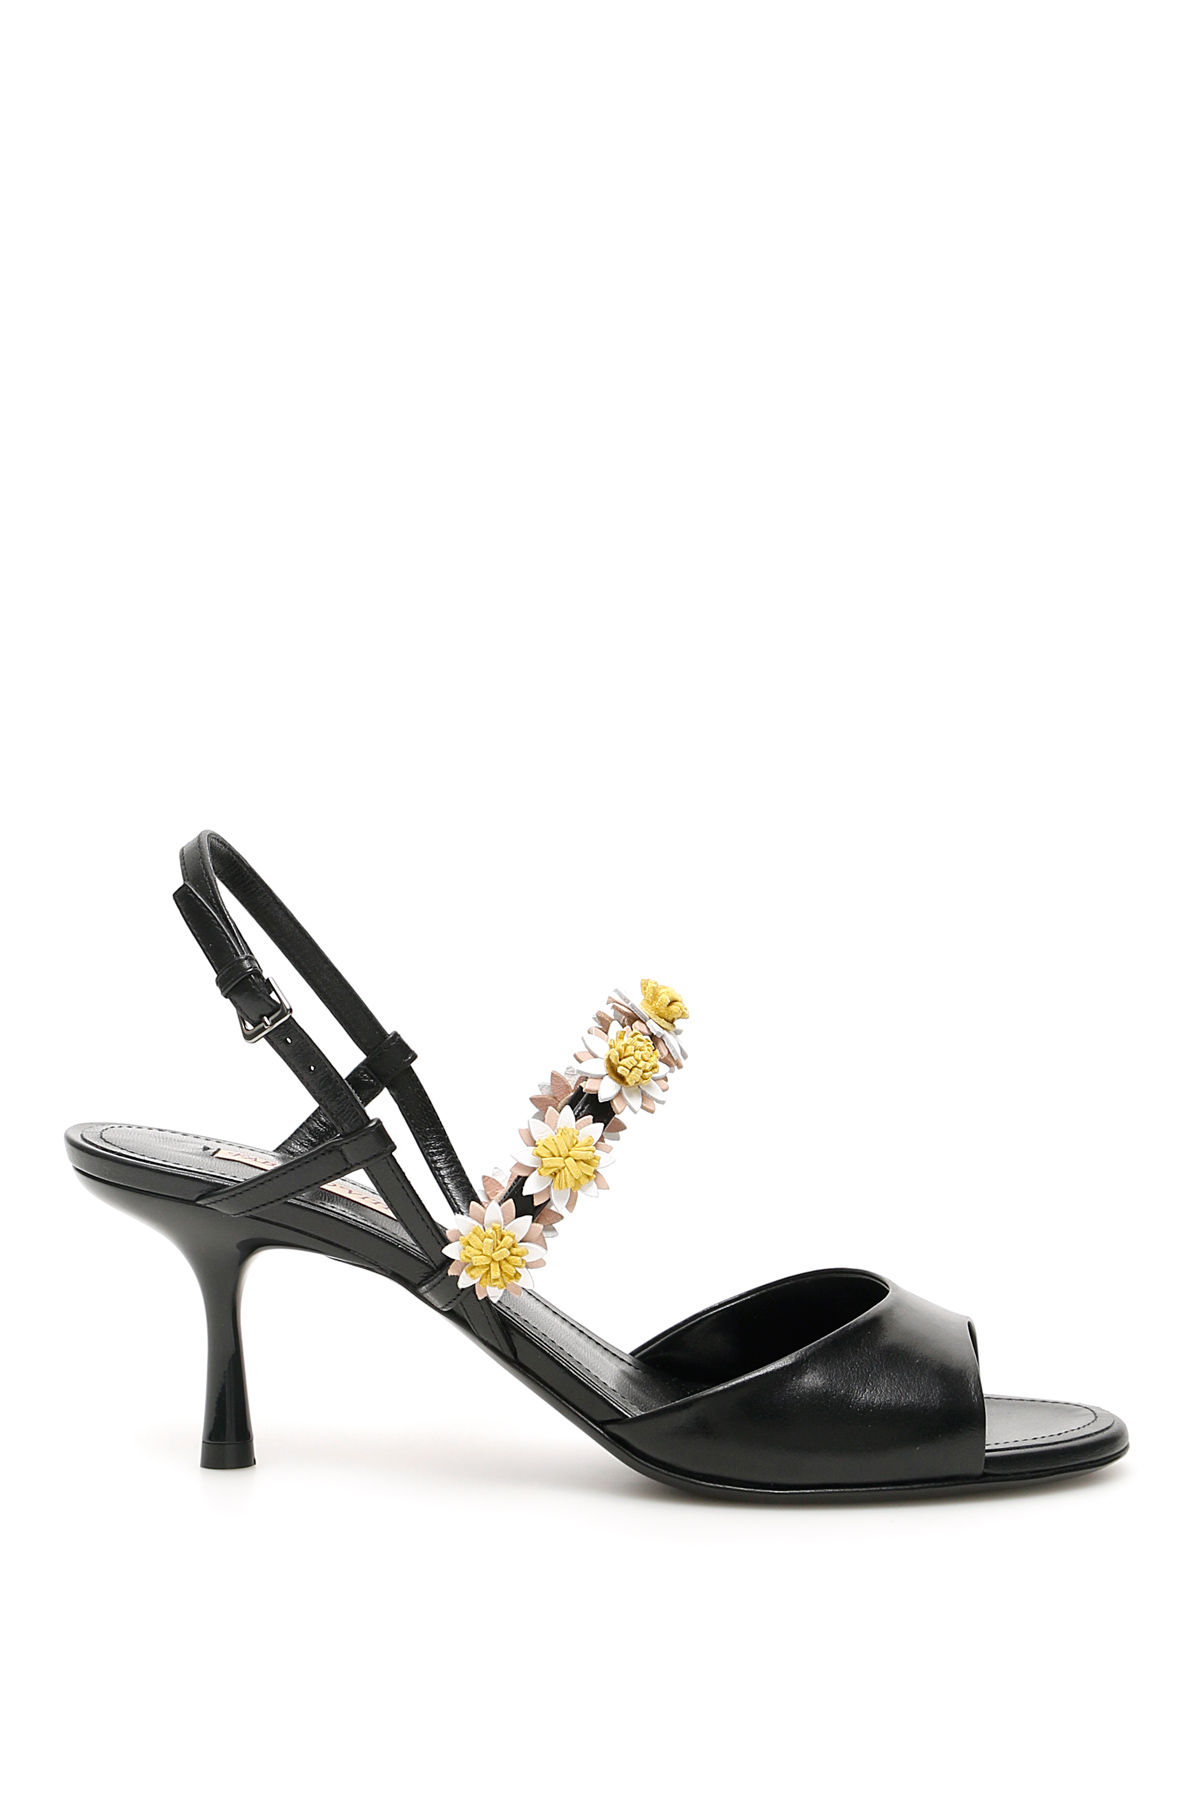 FABRIZIO VITI BEA OPEN-TOE HEELED SANDALS 40 Black, Yellow, White Leather